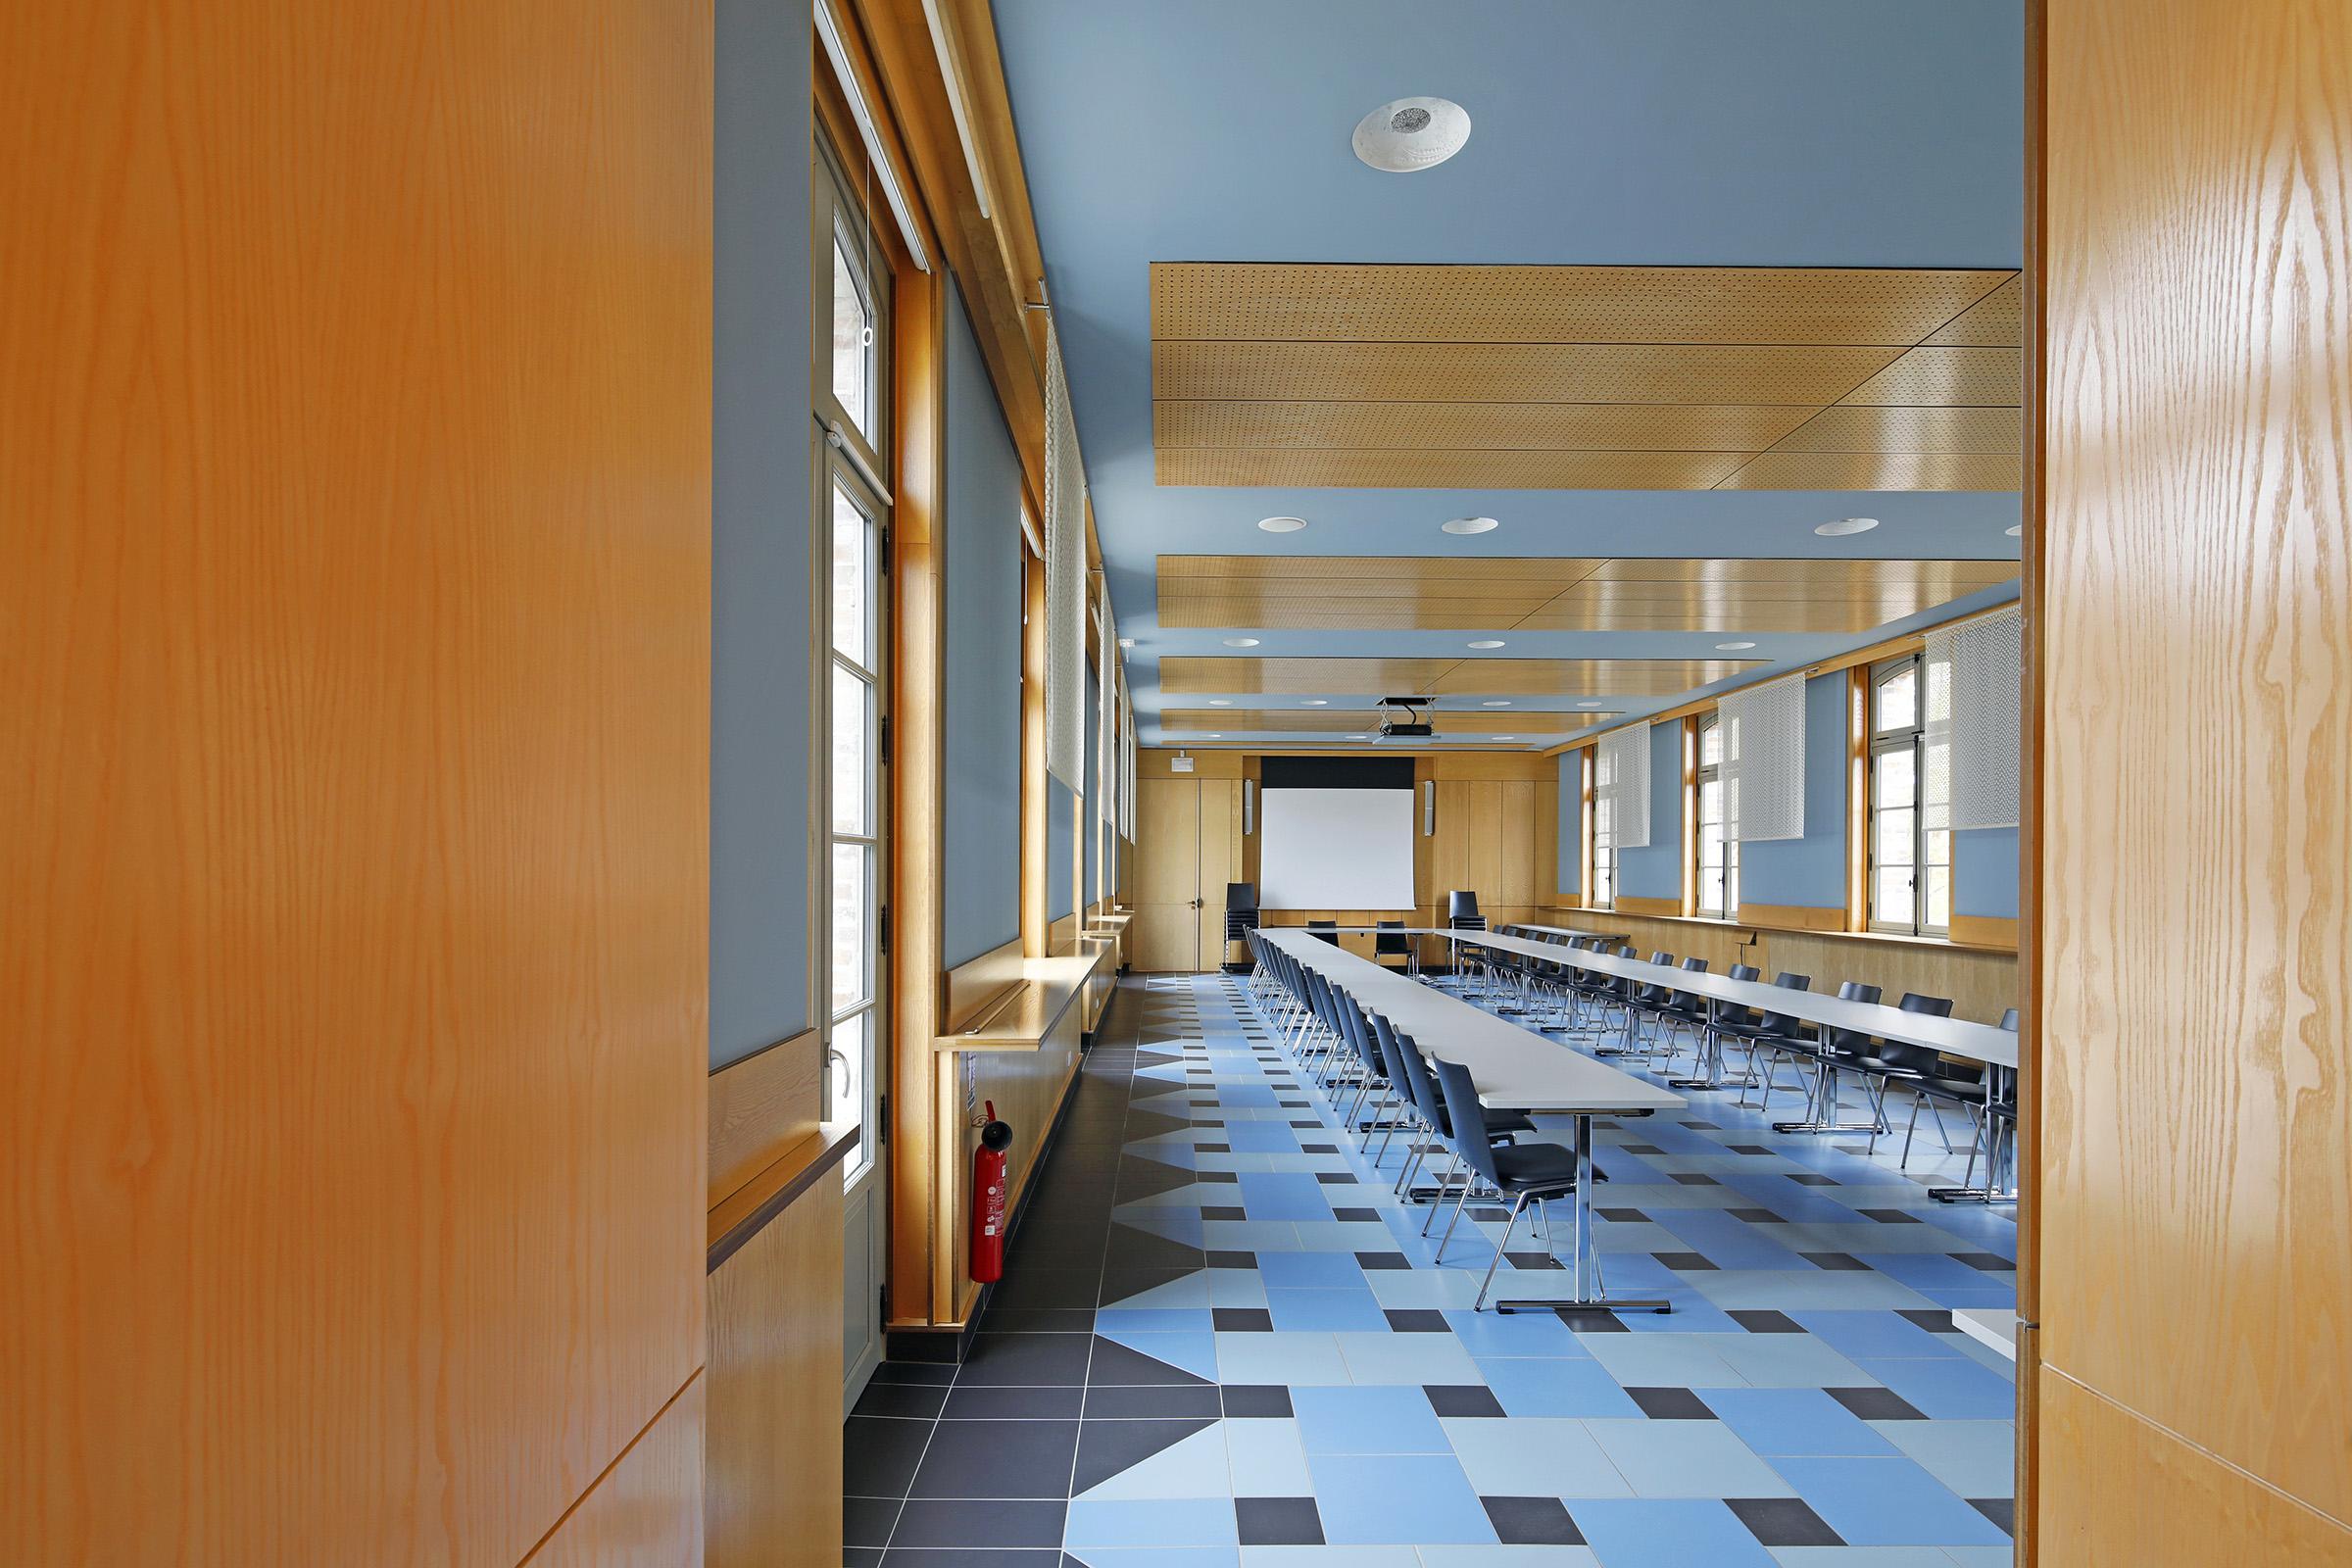 Amilly - La Maison Saint Loup - Interieur - Sylvain Dubuisson 040.jpg